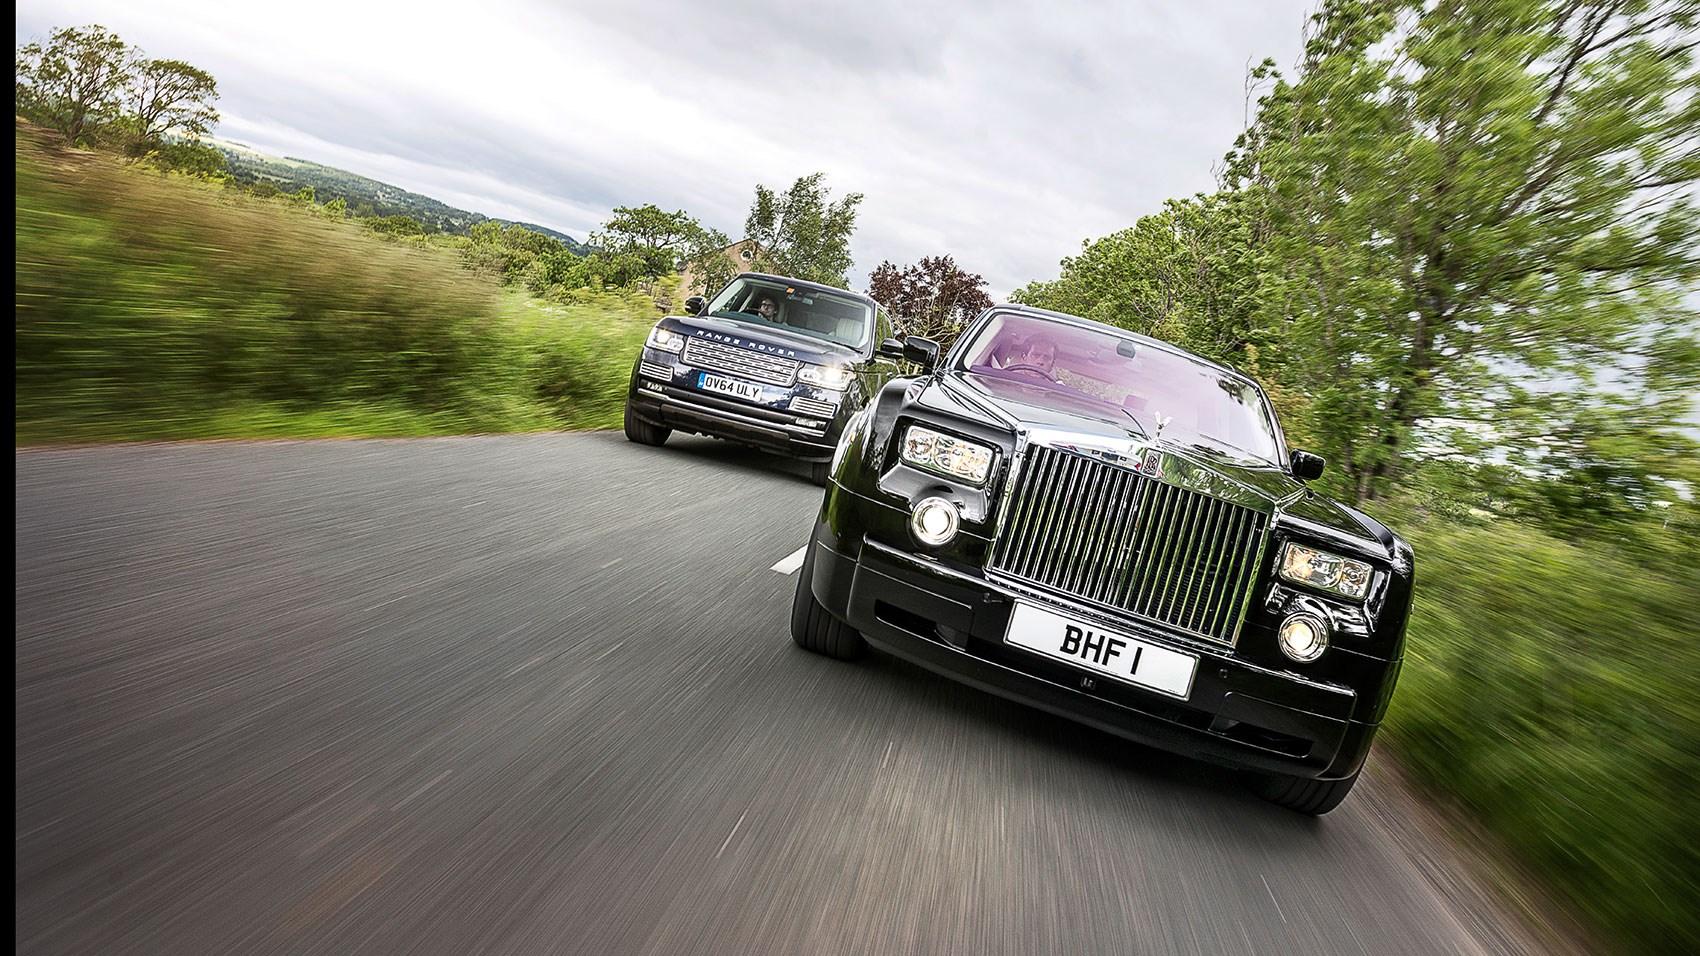 Icon buyer: new Range Rover vs used Rolls-Royce Phantom, CAR+